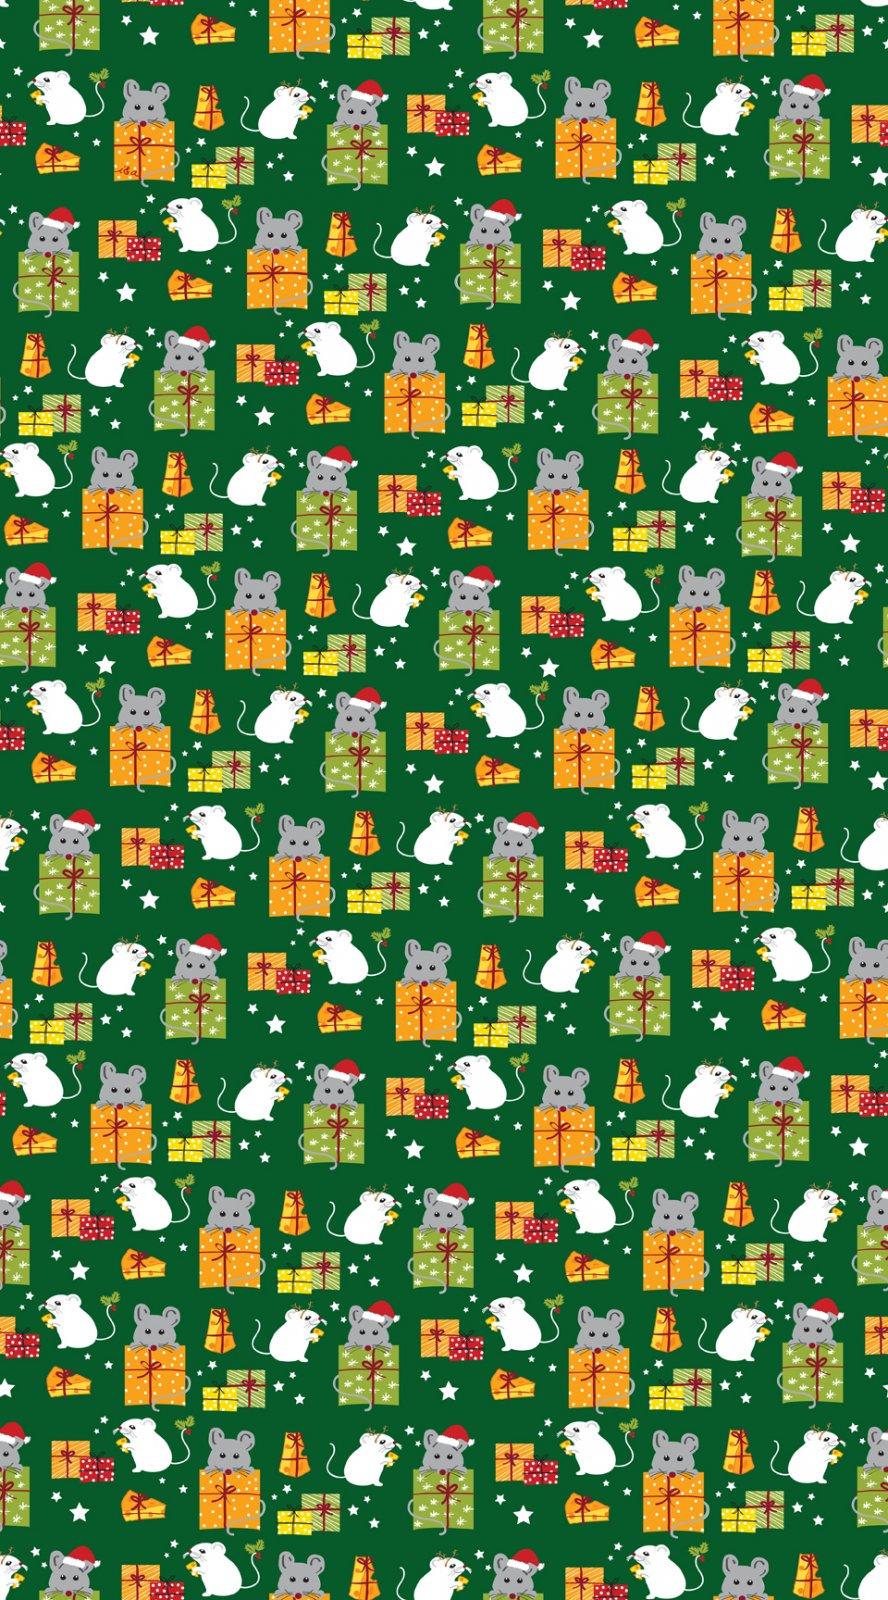 QT- Meowy Christmas (Mice & Gifts) Green